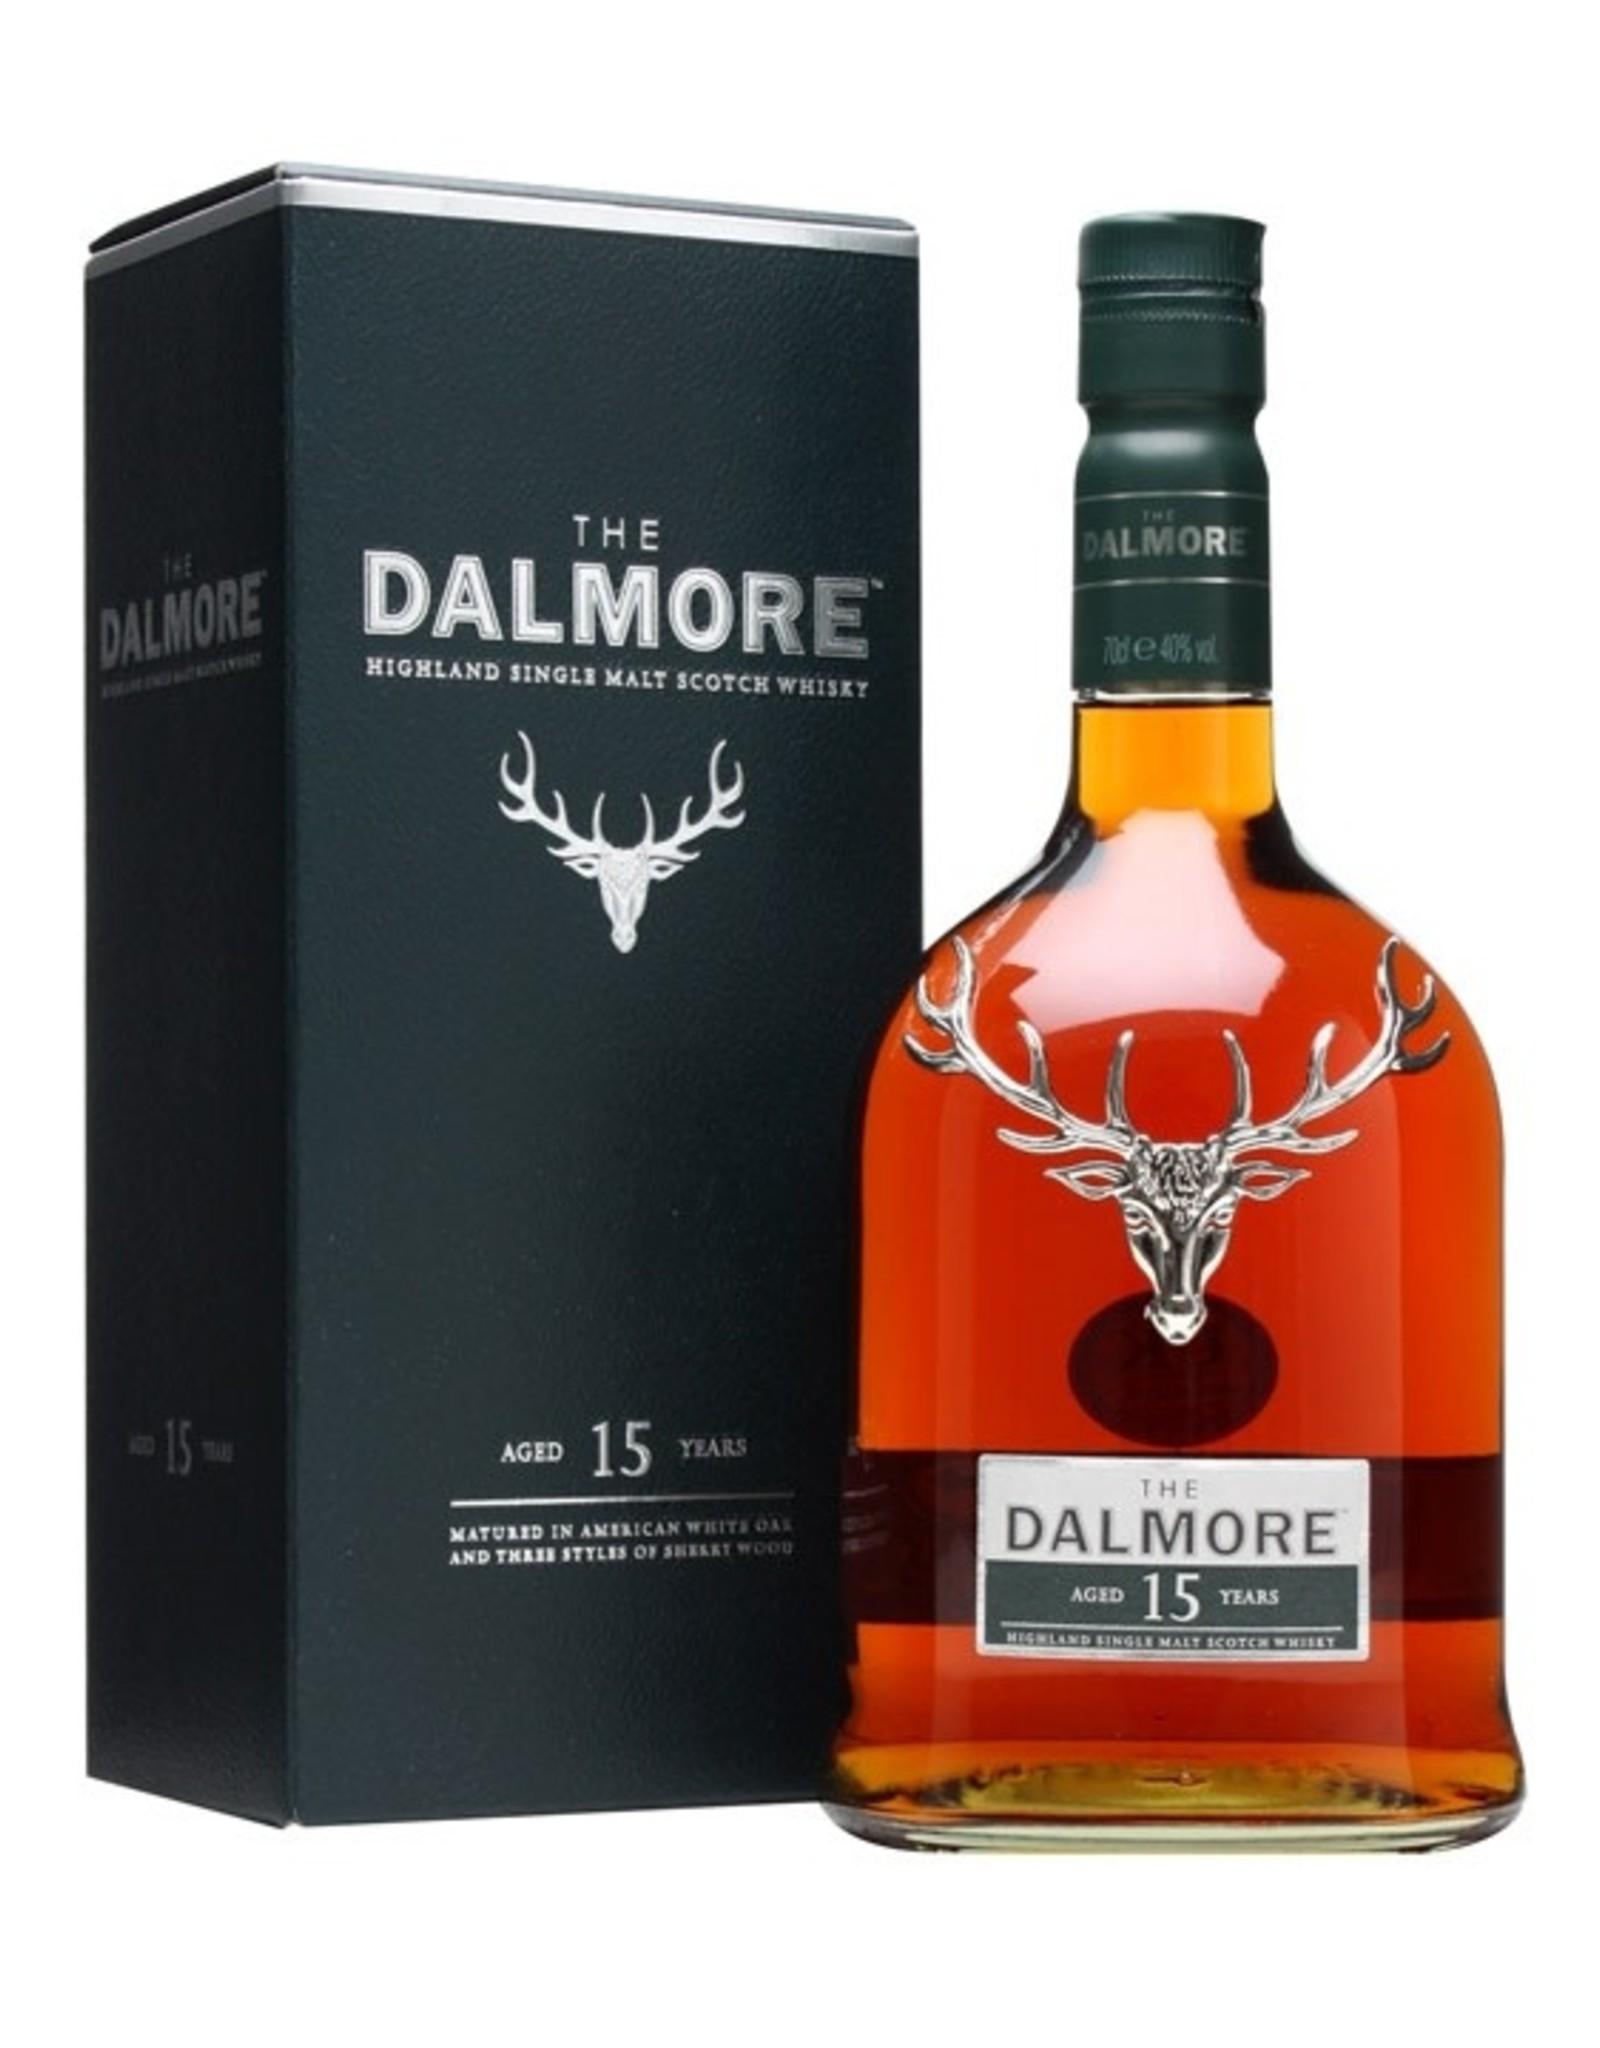 Dalmore 15 year Single Malt Scotch Whisky